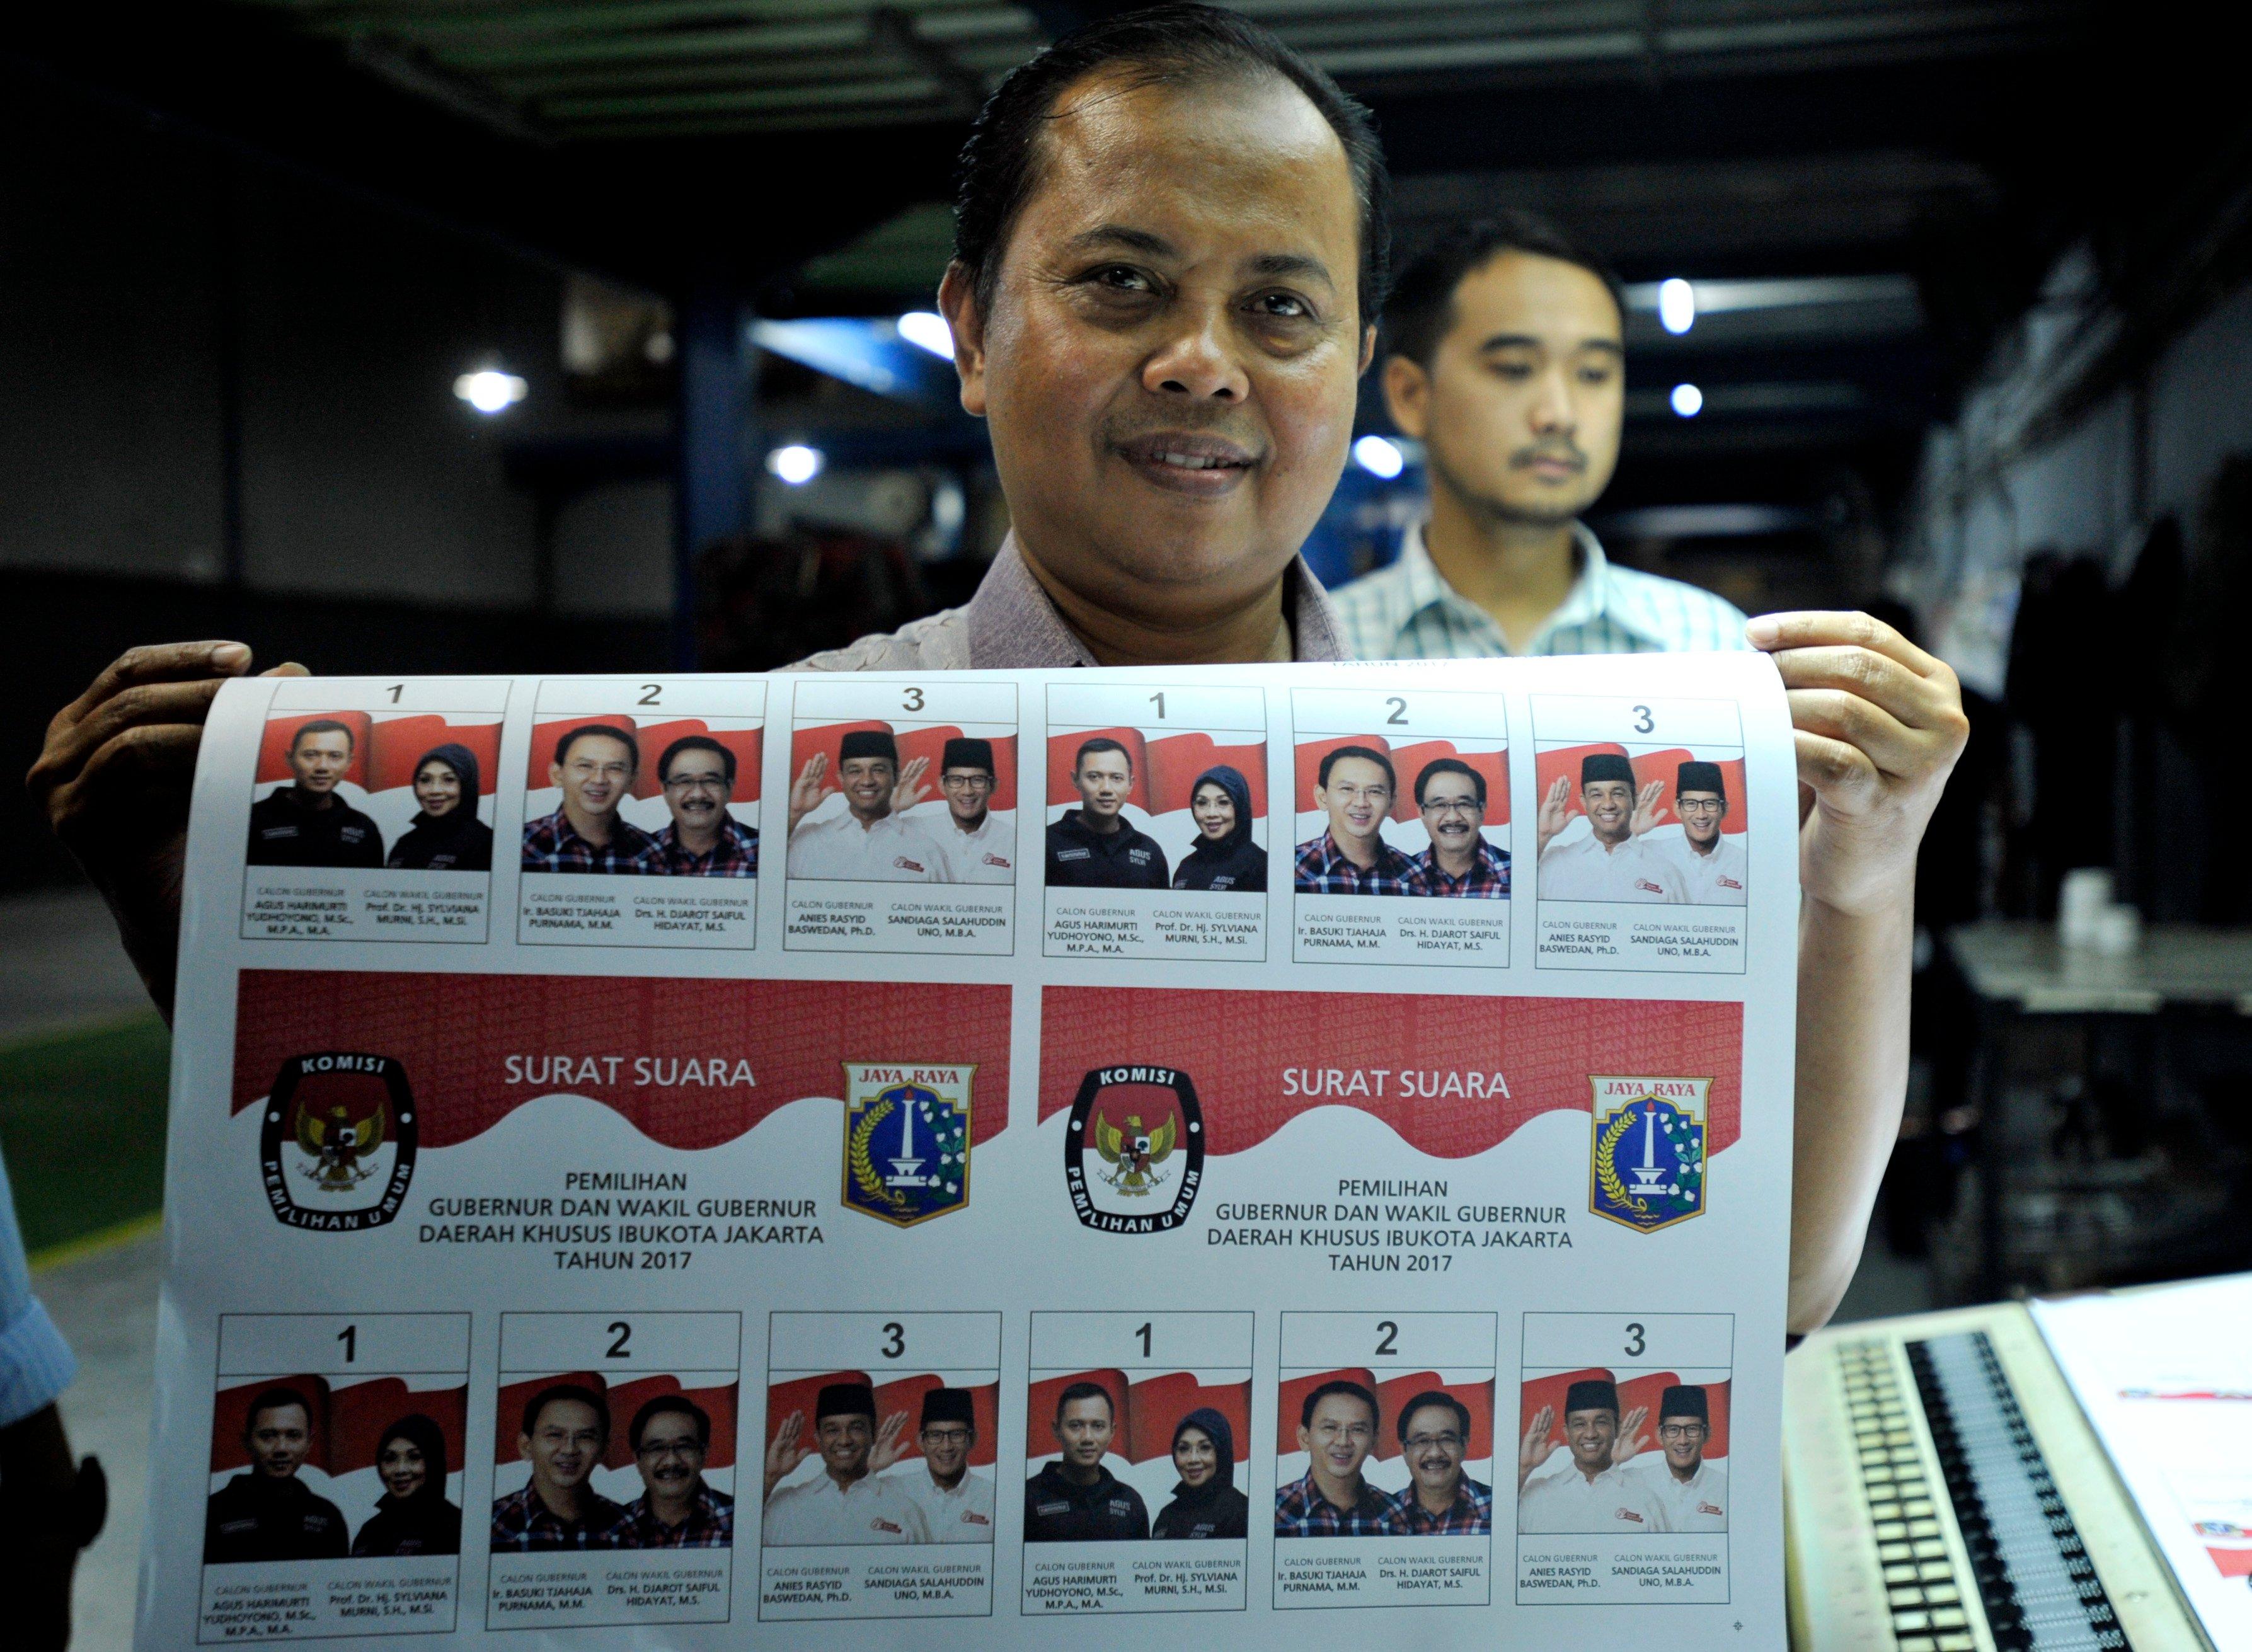 Debat Pertama Kandidat Pilkada Dki Bahas Soal Sosial Ekonomi Tirto Id